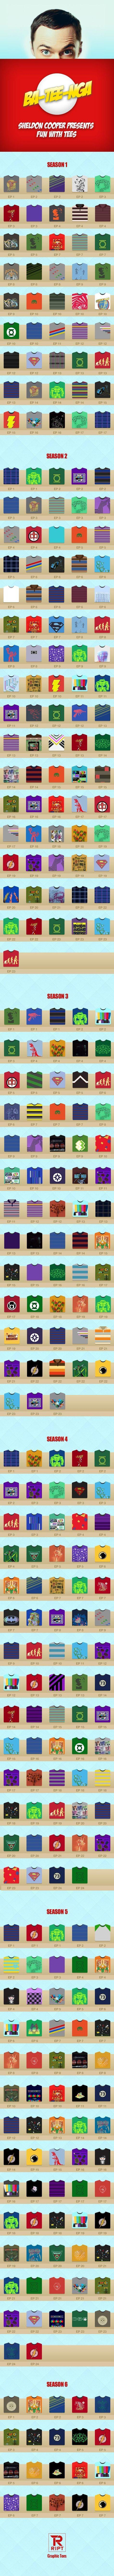 Every T-Shirt Sheldon Cooper Has Ever Worn In The #BigBangTheory